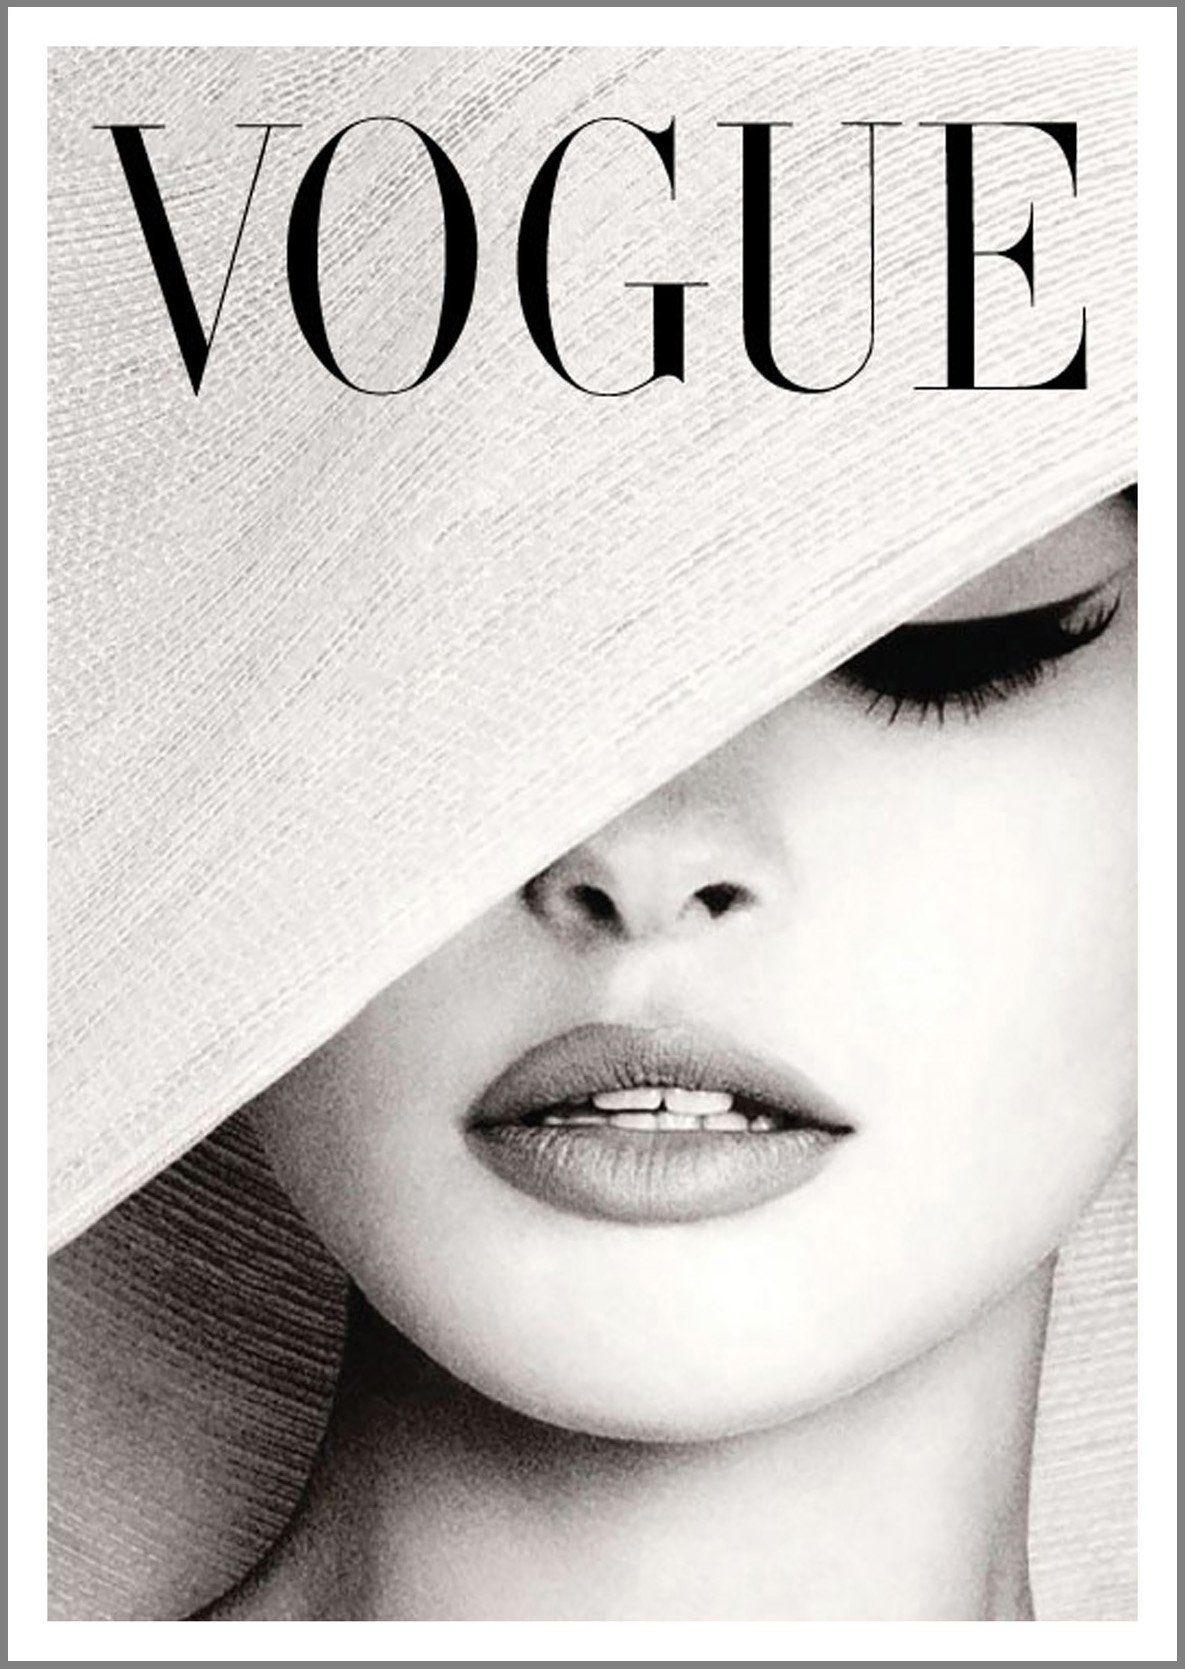 Vintage Print Paper Poster Canvas Framed Art by Vogue black white lady hat